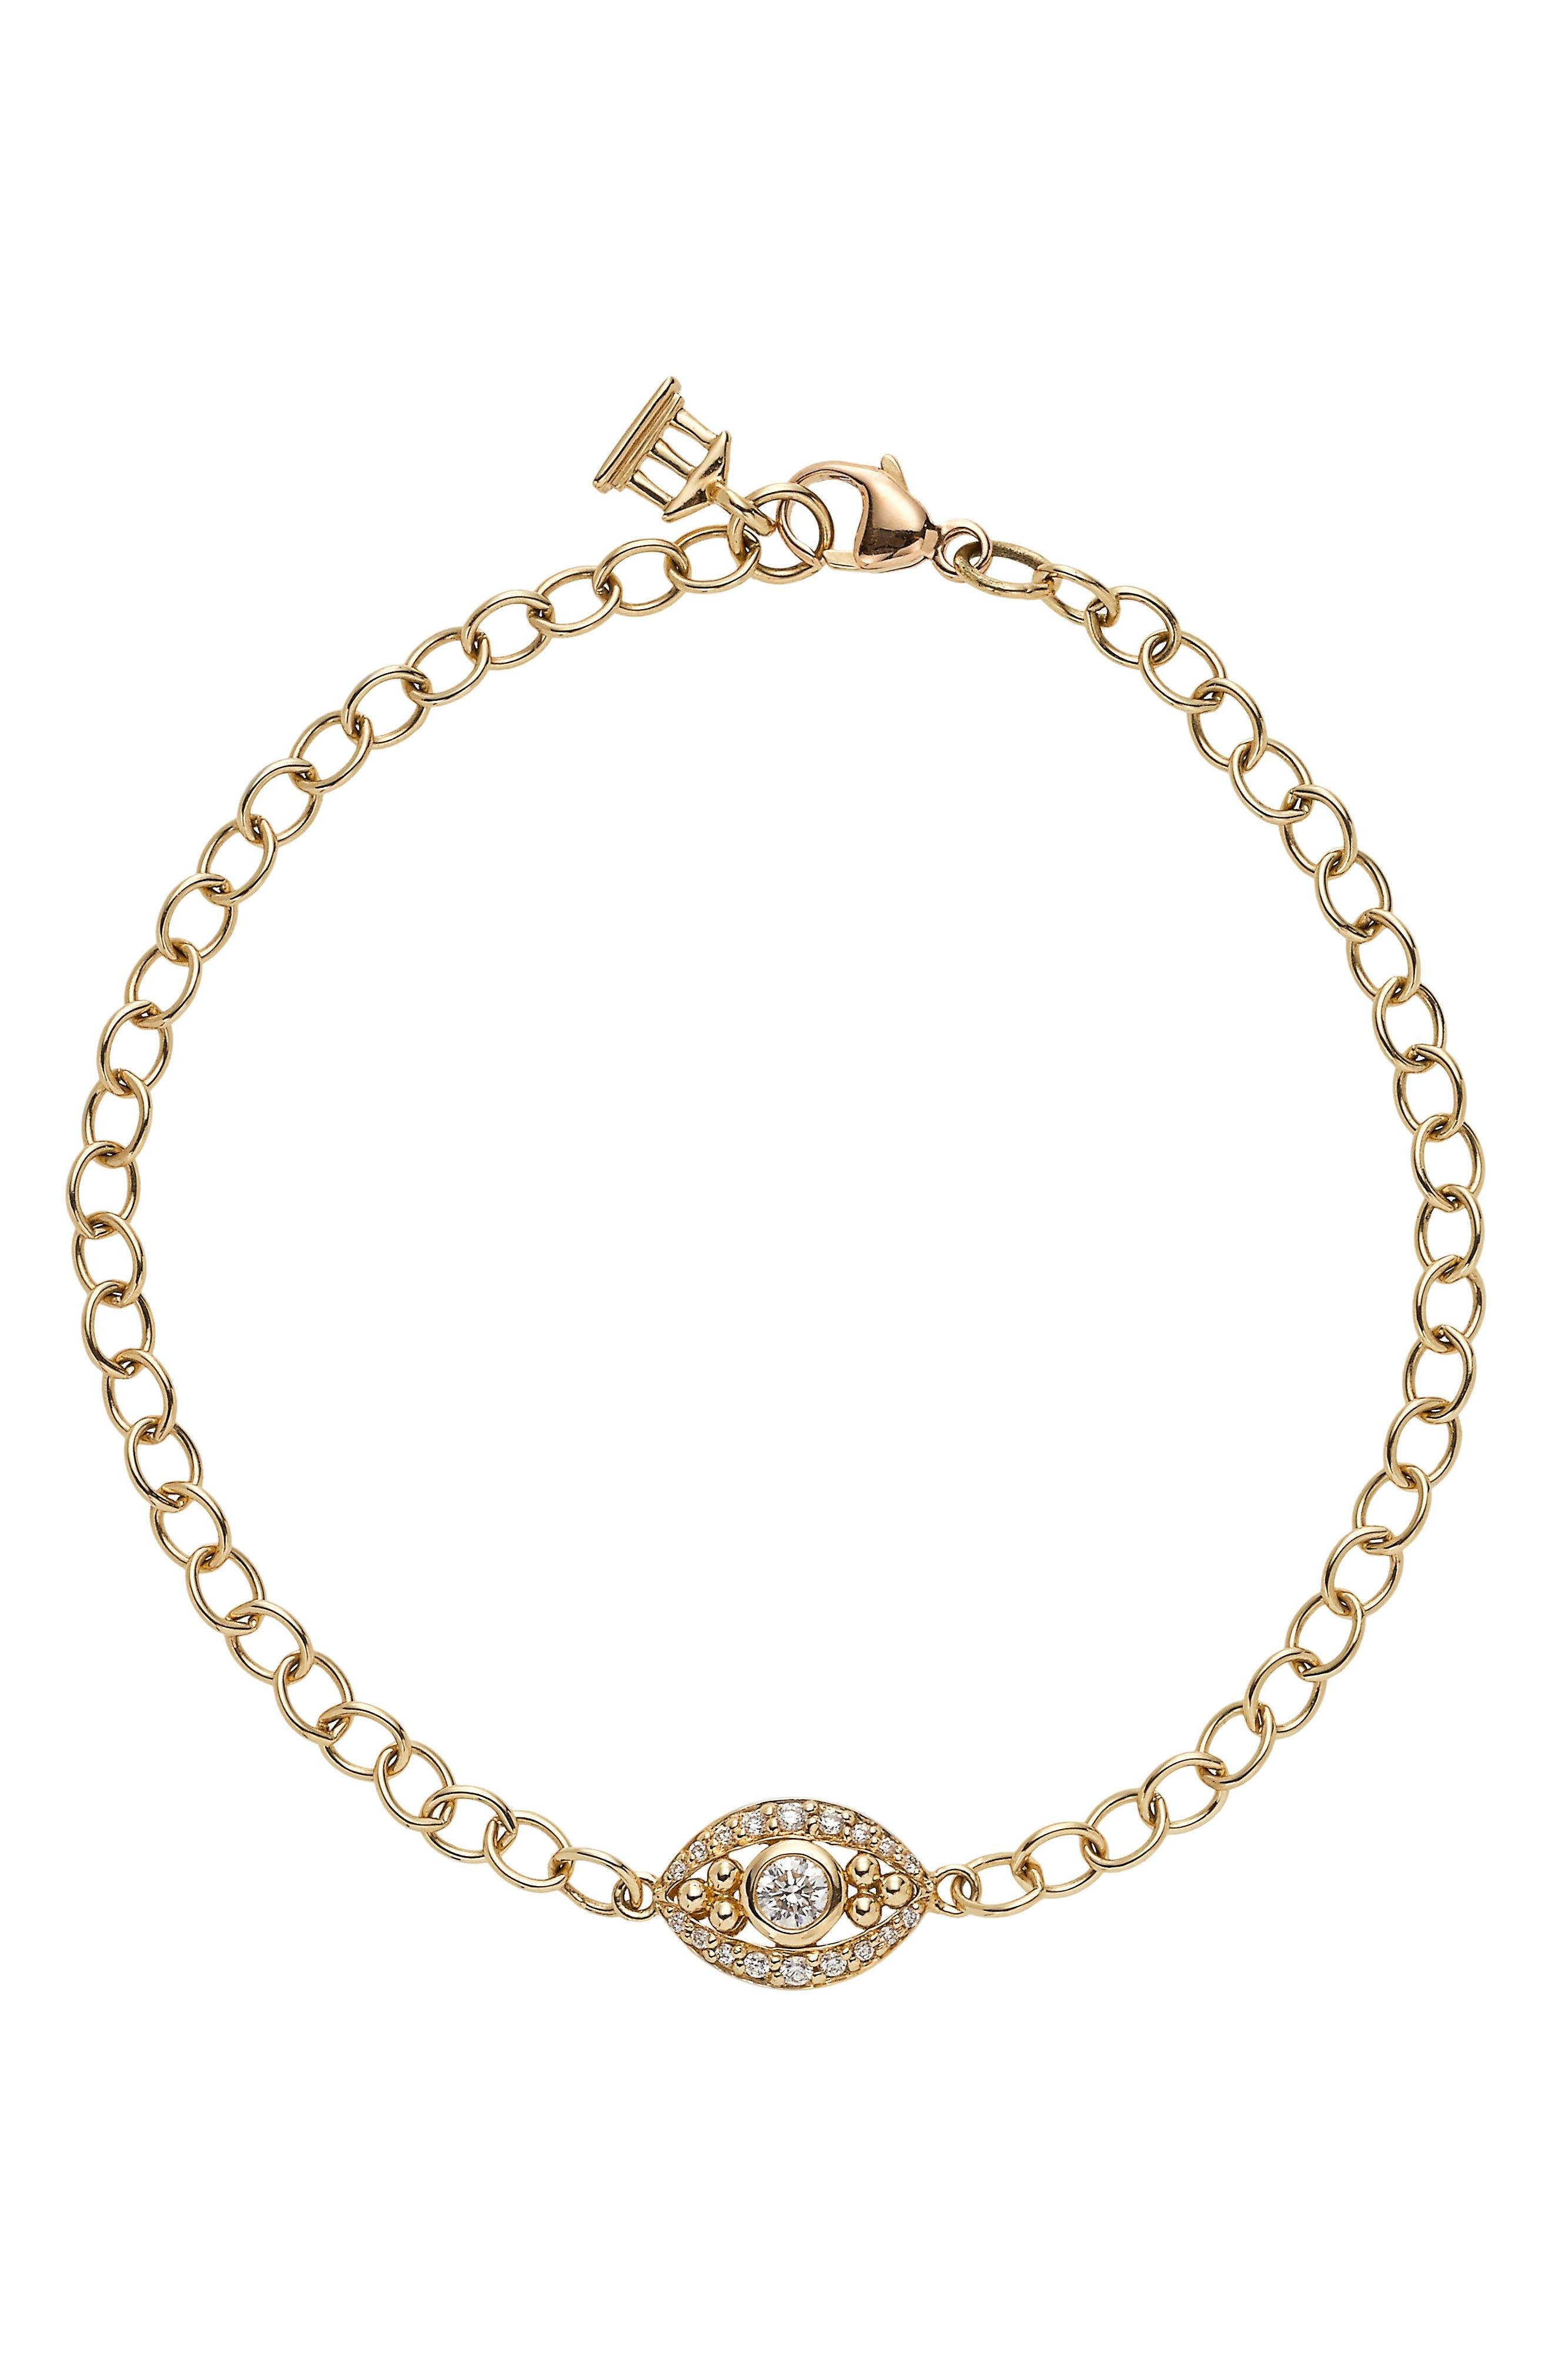 Main Image - Temple St. Clair Diamond Evil Eye Line Bracelet